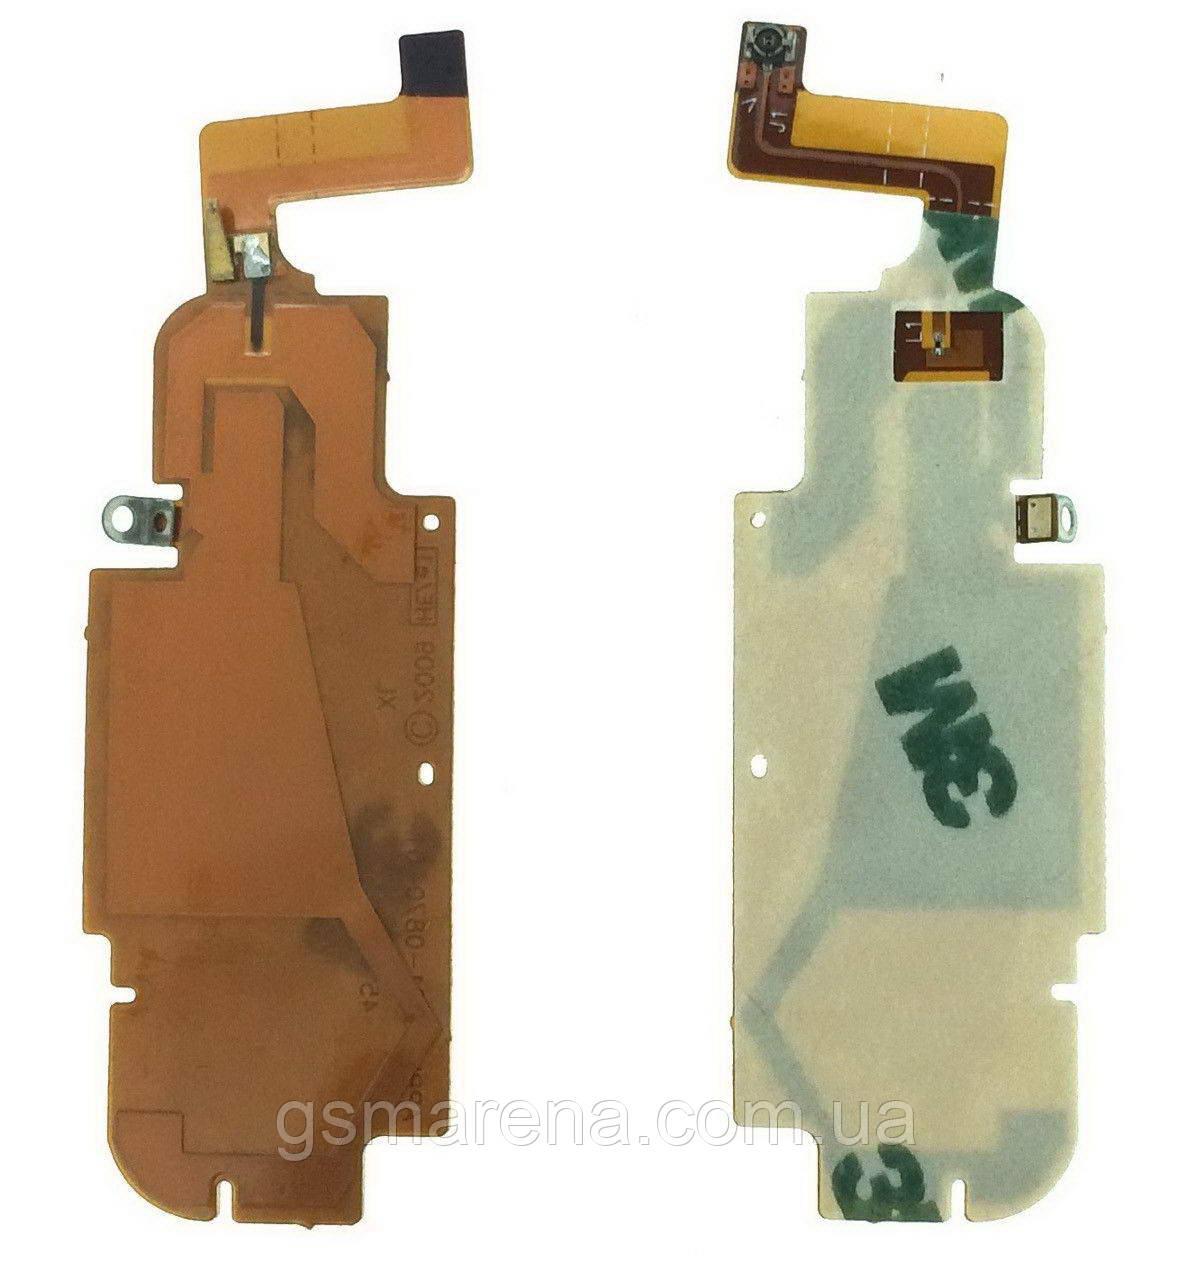 Антенна Apple iPhone 3GS (только шлейф)